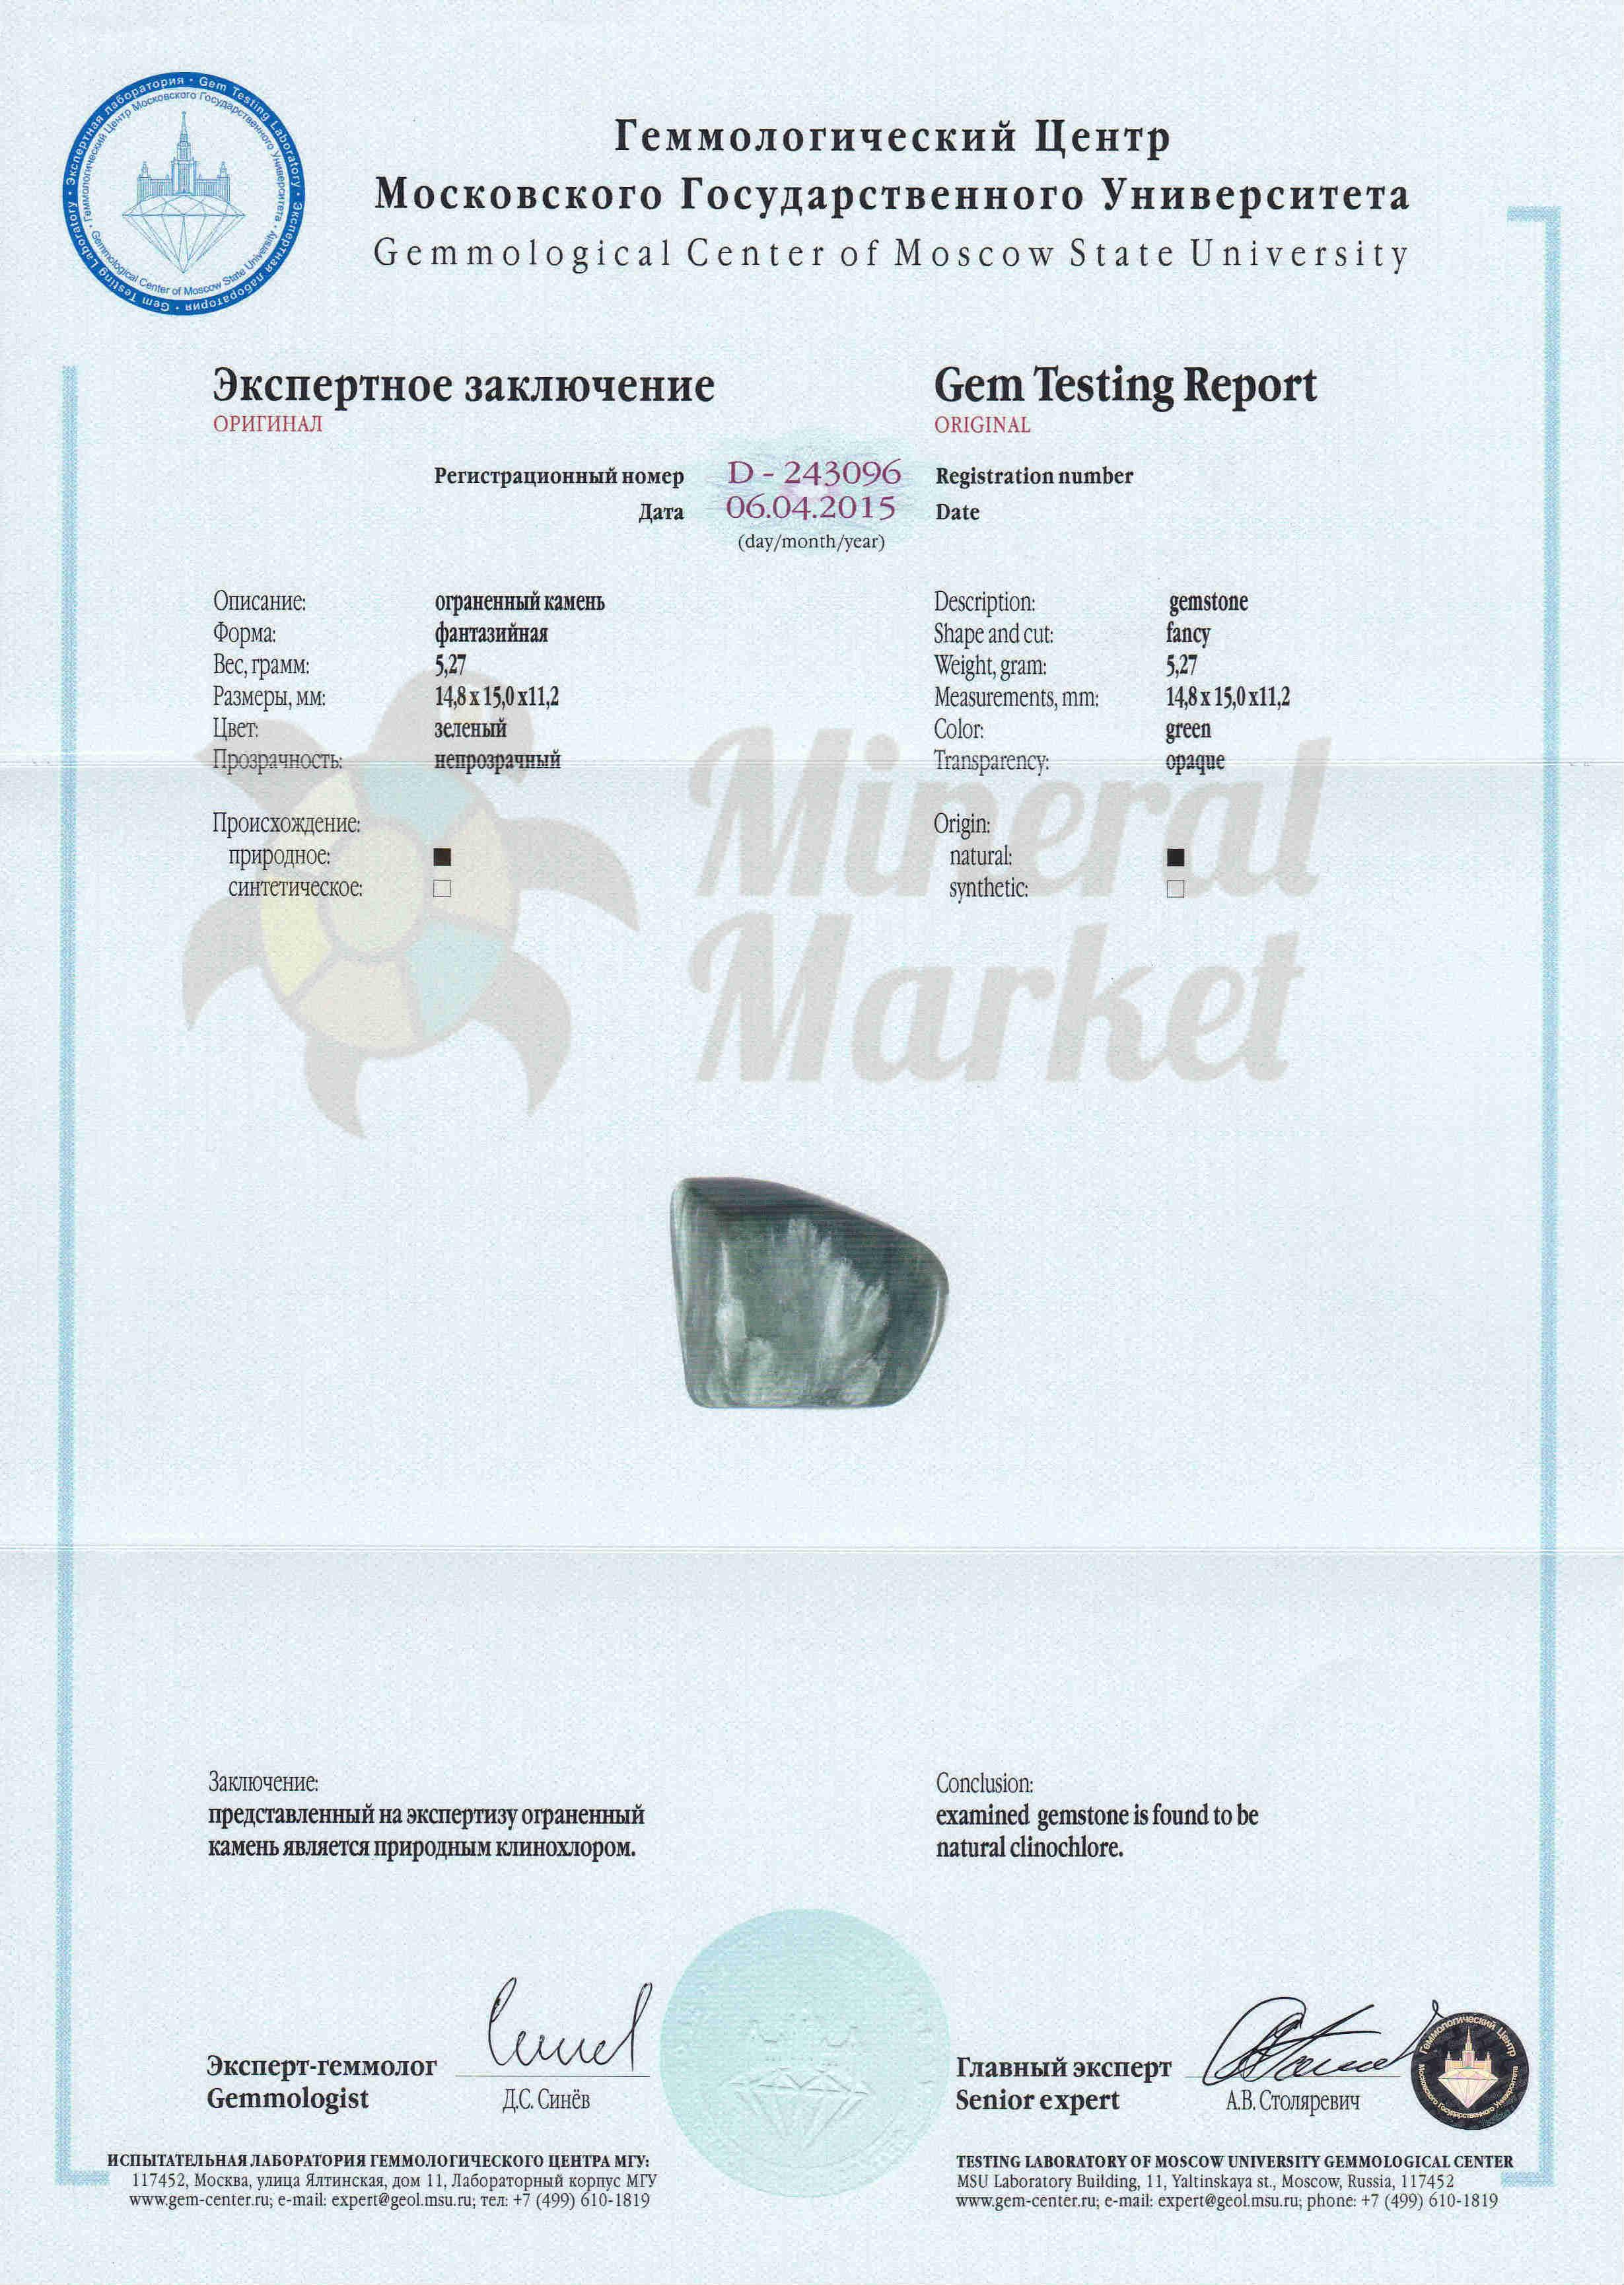 http://mineralmarket.ru/img/certificate/59.jpg